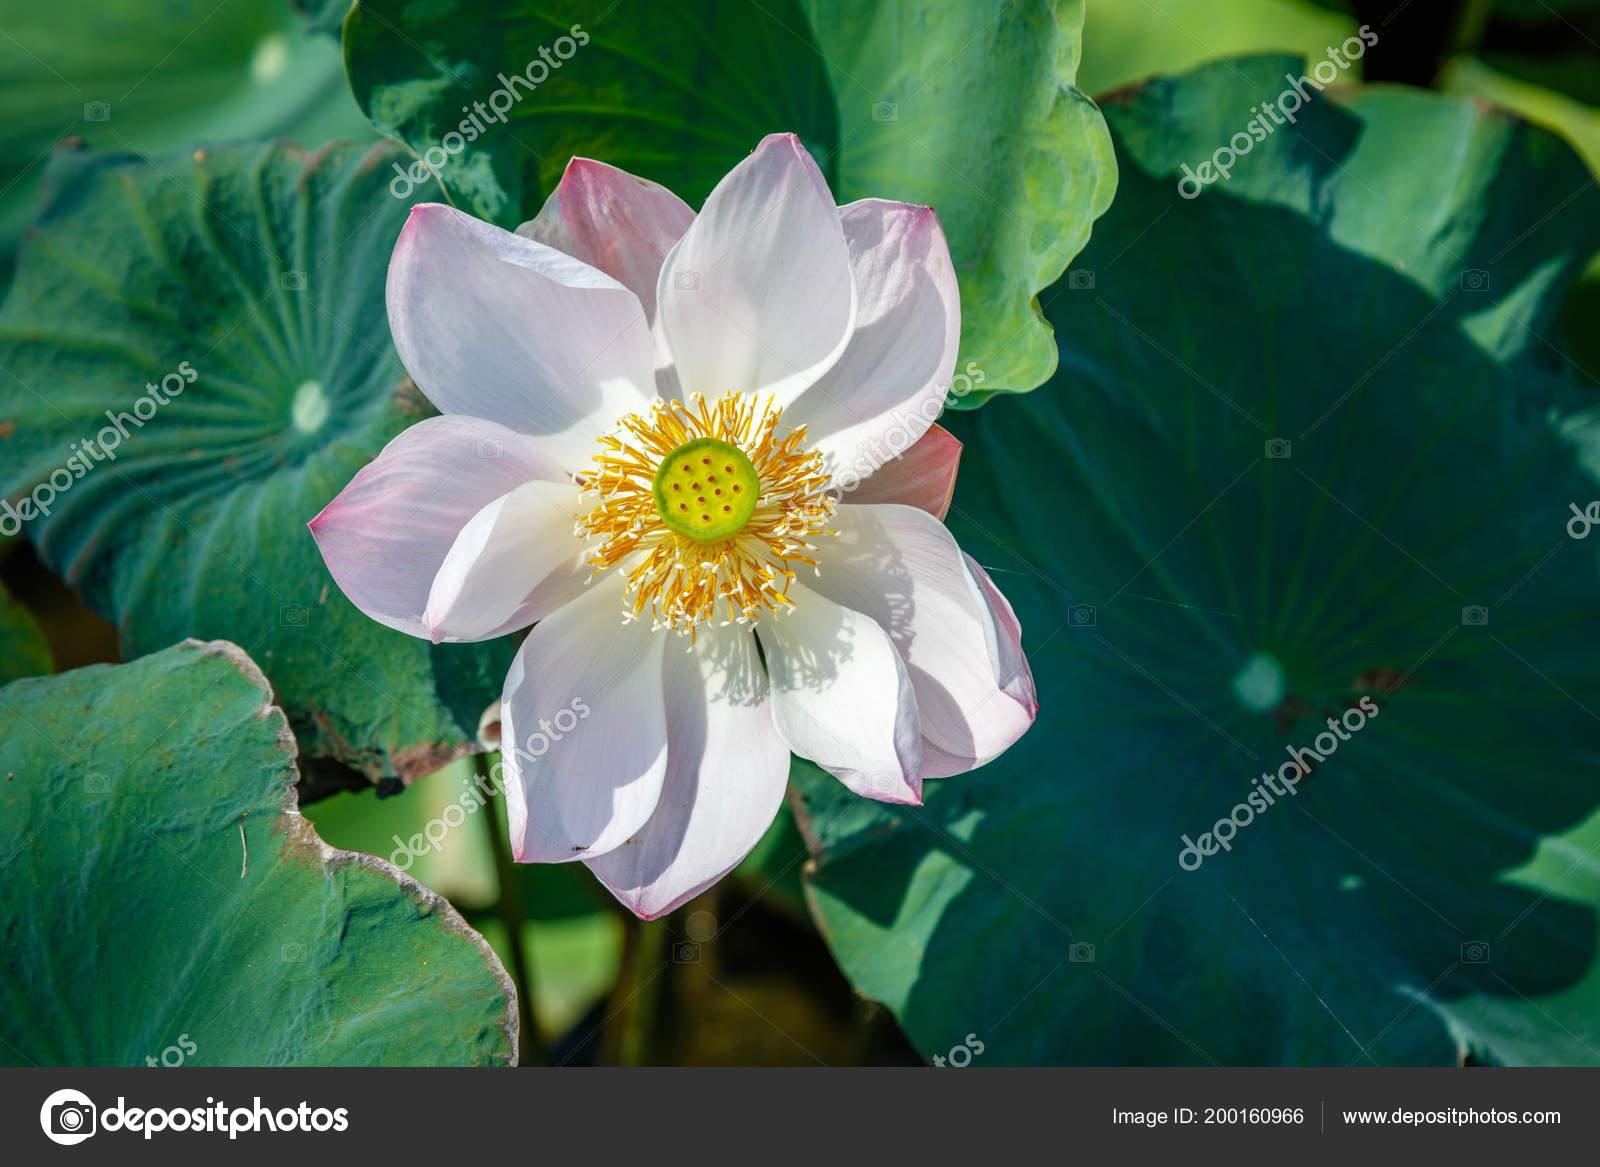 Blooming White Wild Lotus Flower Ubud Bali Island Indonesia Stock